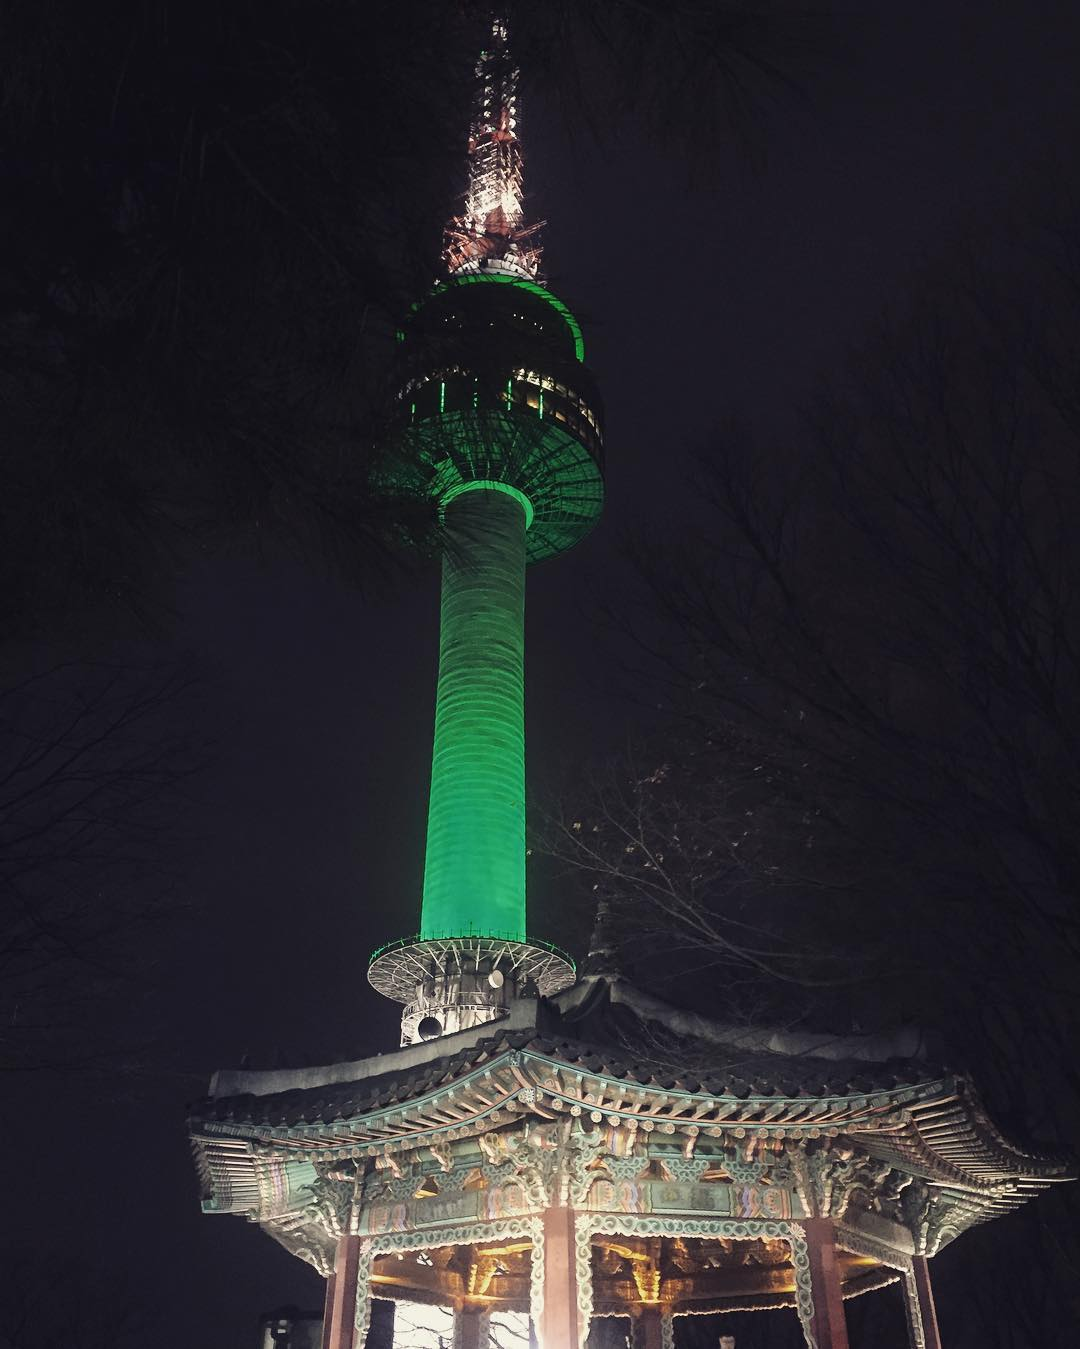 N Seoul Tower berwarna hijau